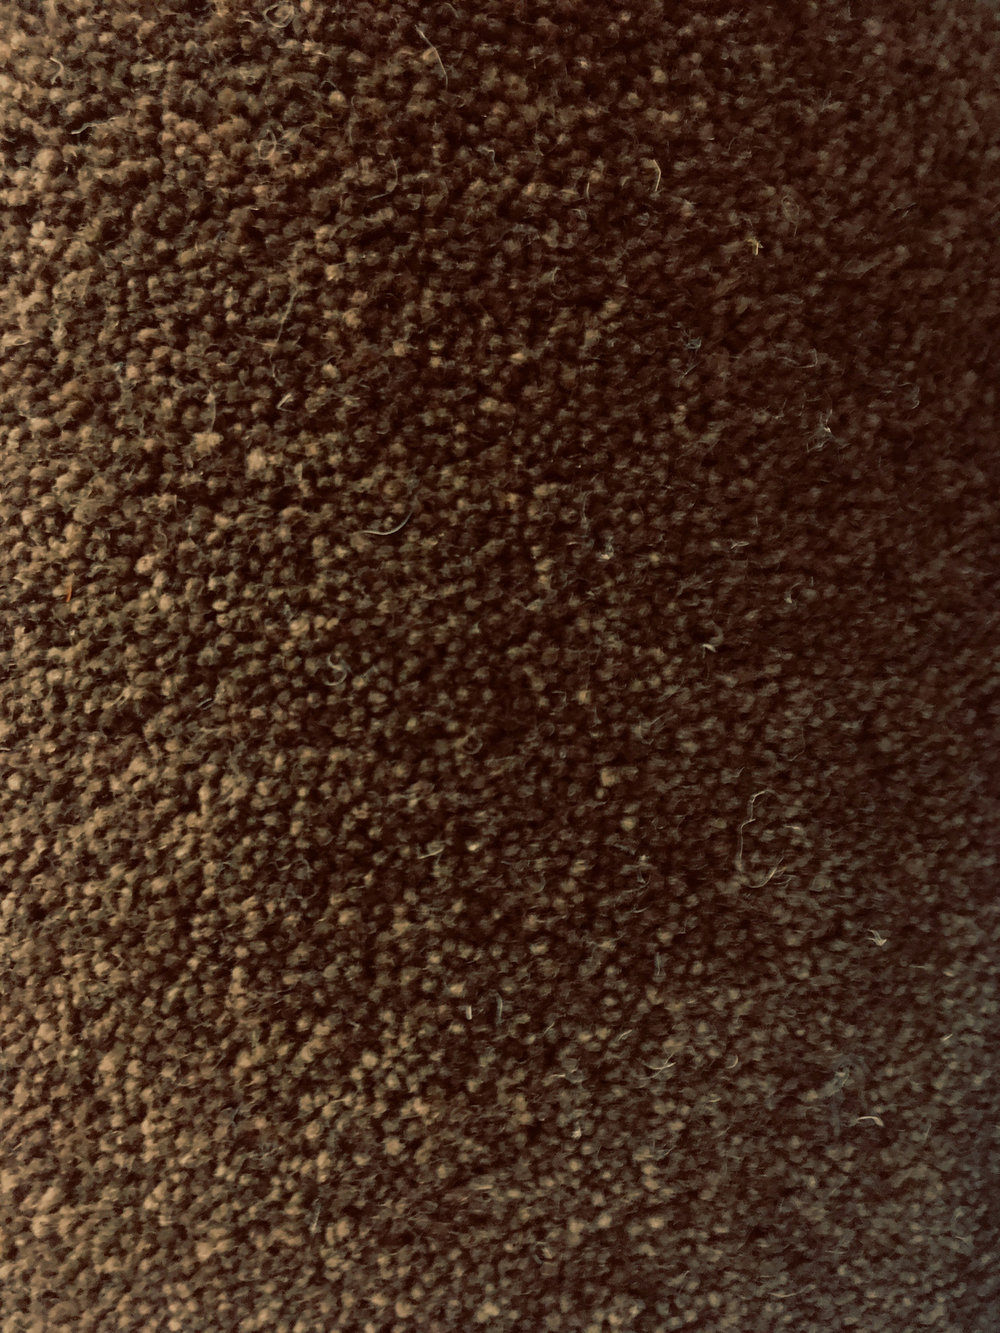 Cathedral 50oz - Colour: Latte80/20Size: 3.70 x 3.59MPrice: £172.68